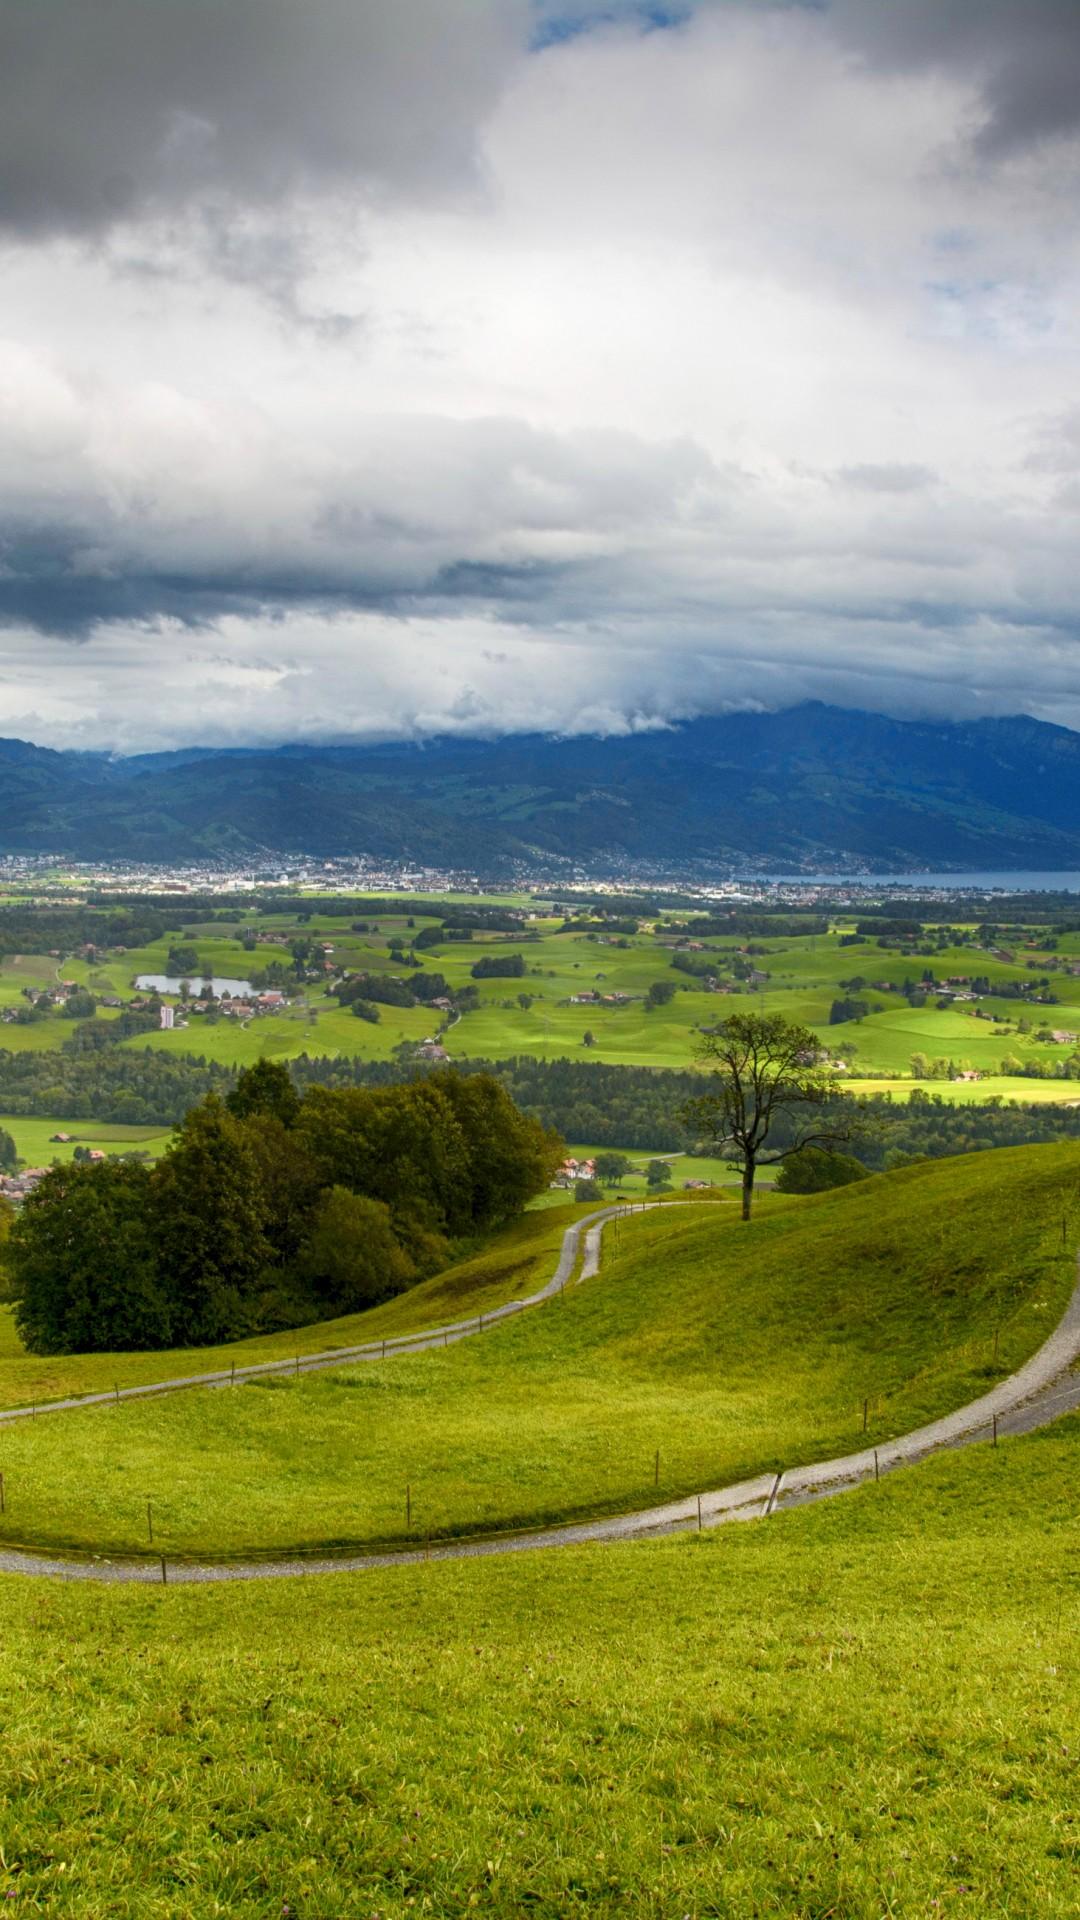 Wallpaper Switzerland 4k Hd Wallpaper Hills Mountains Trees Clouds Nature 5288